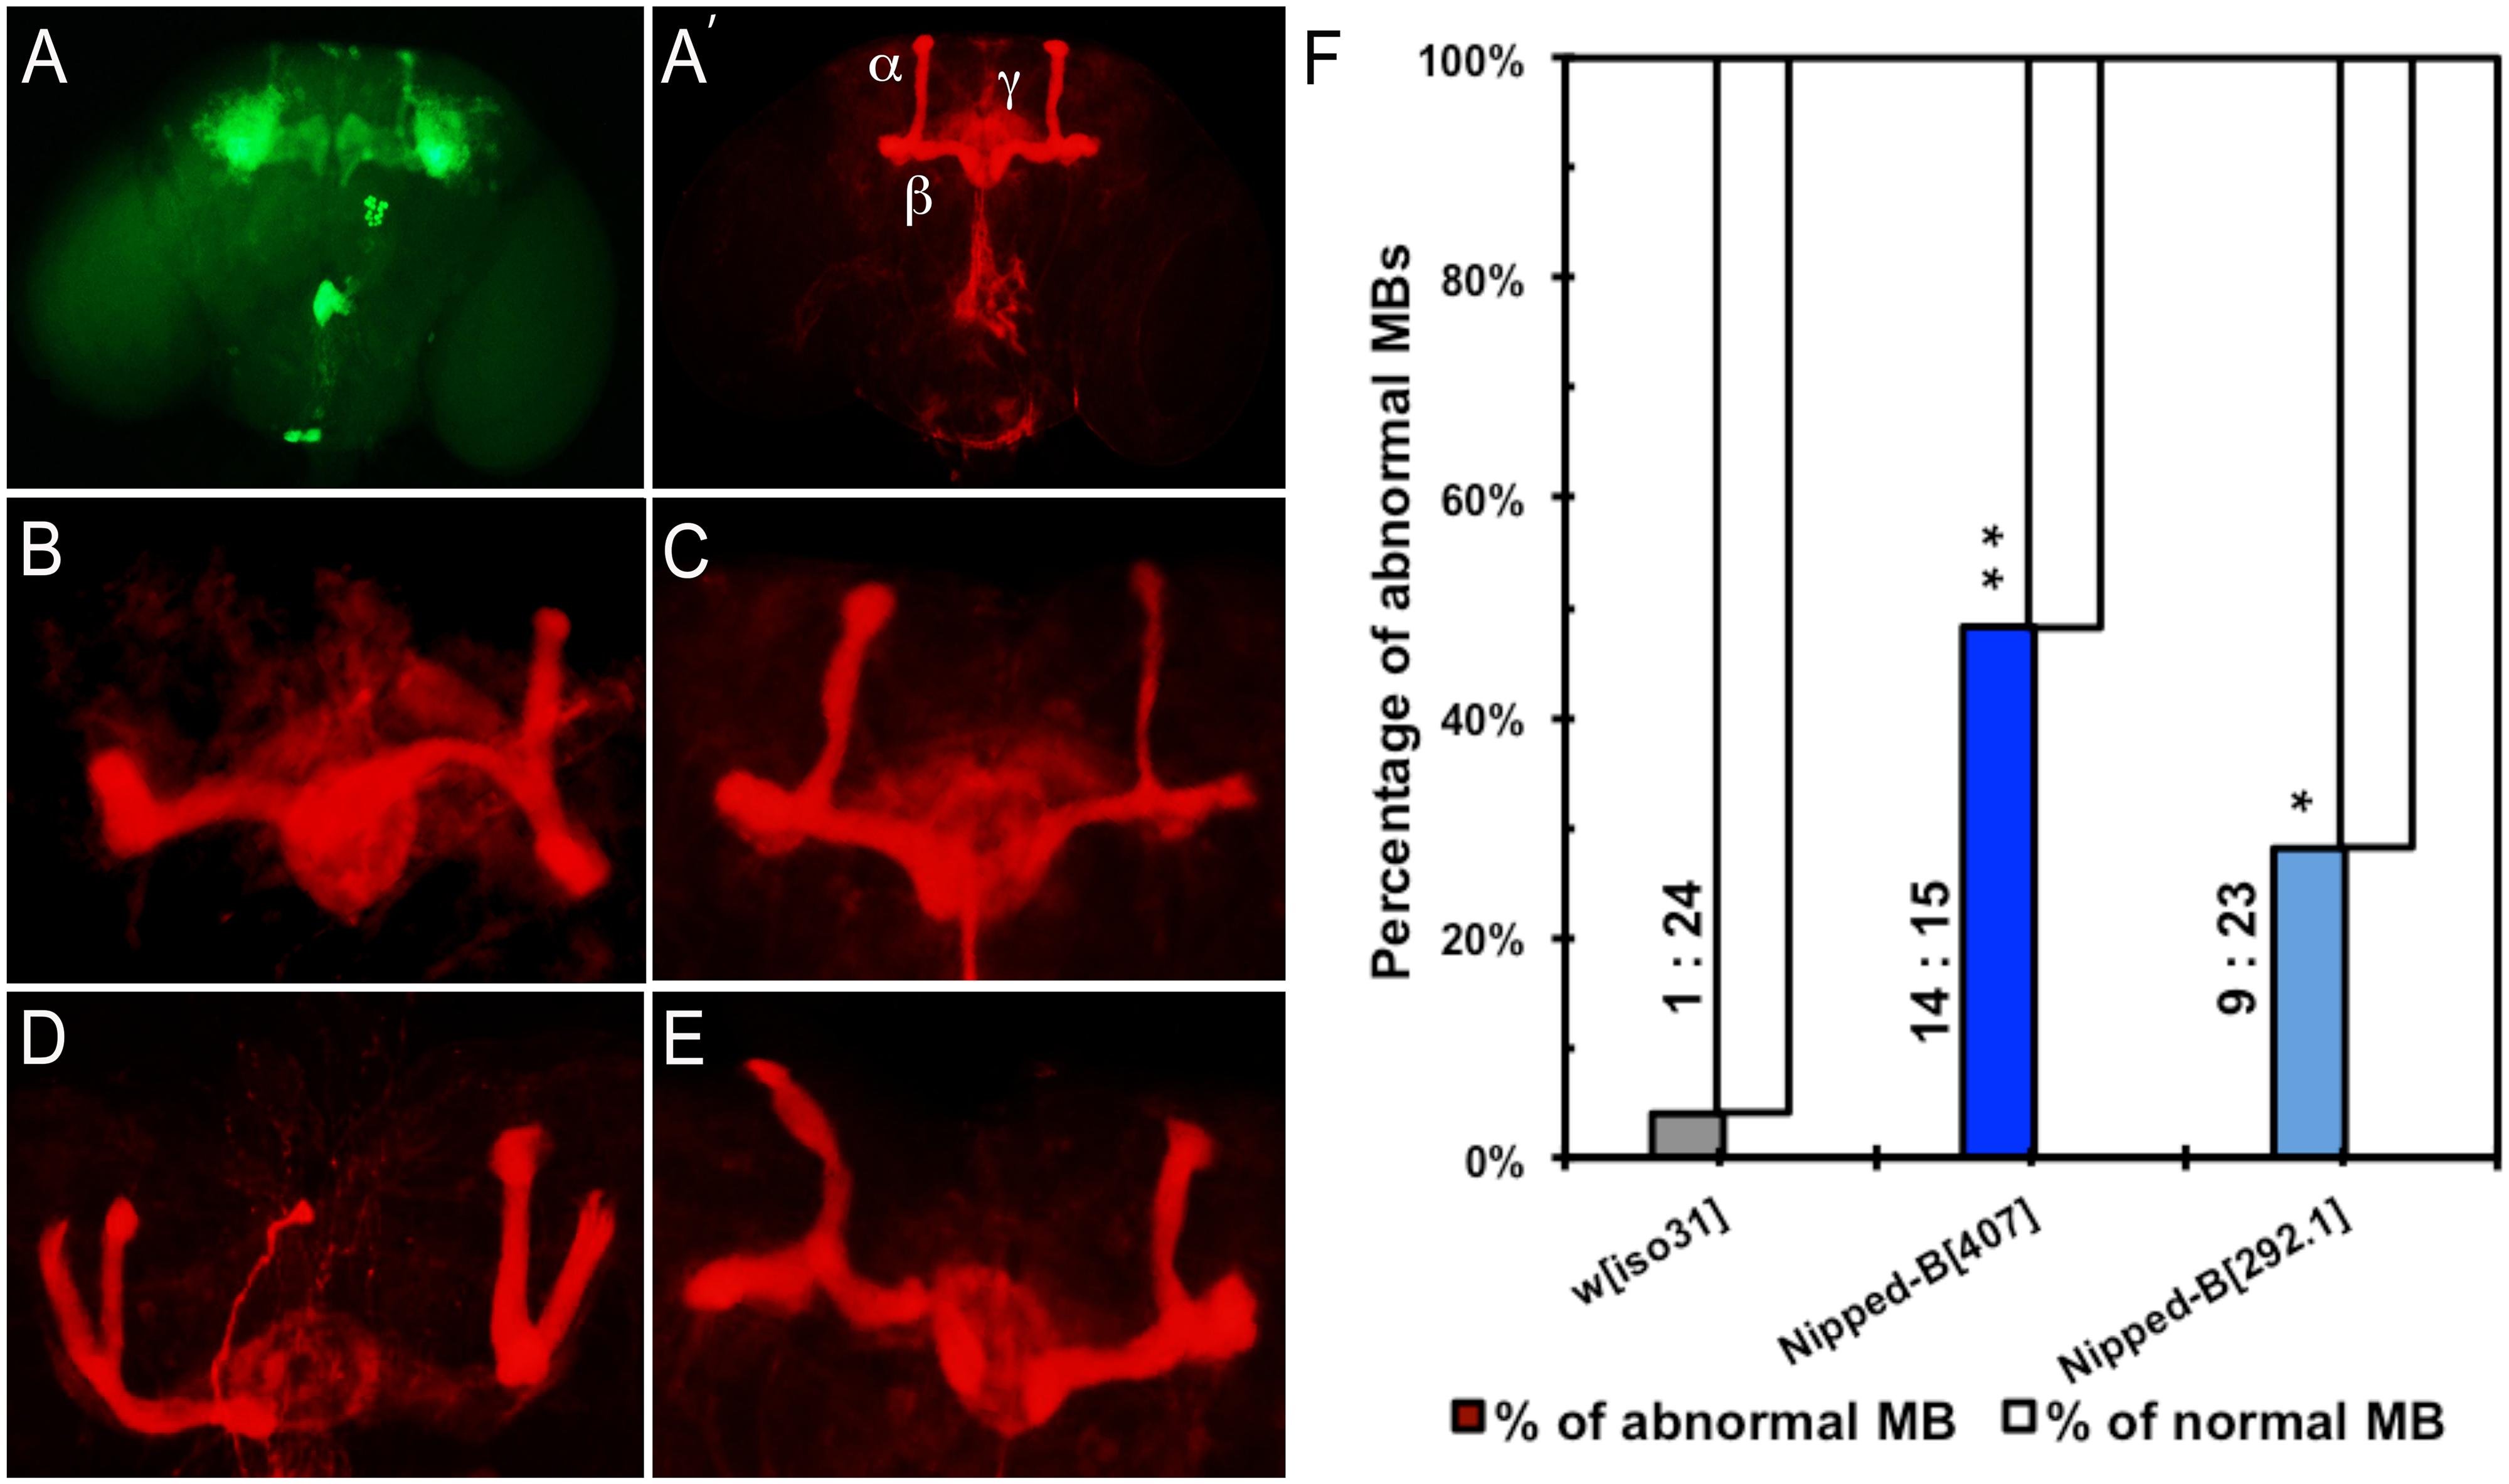 Mushroom body abnormalities seen in <i>Nipped-B</i> heterozygotes.